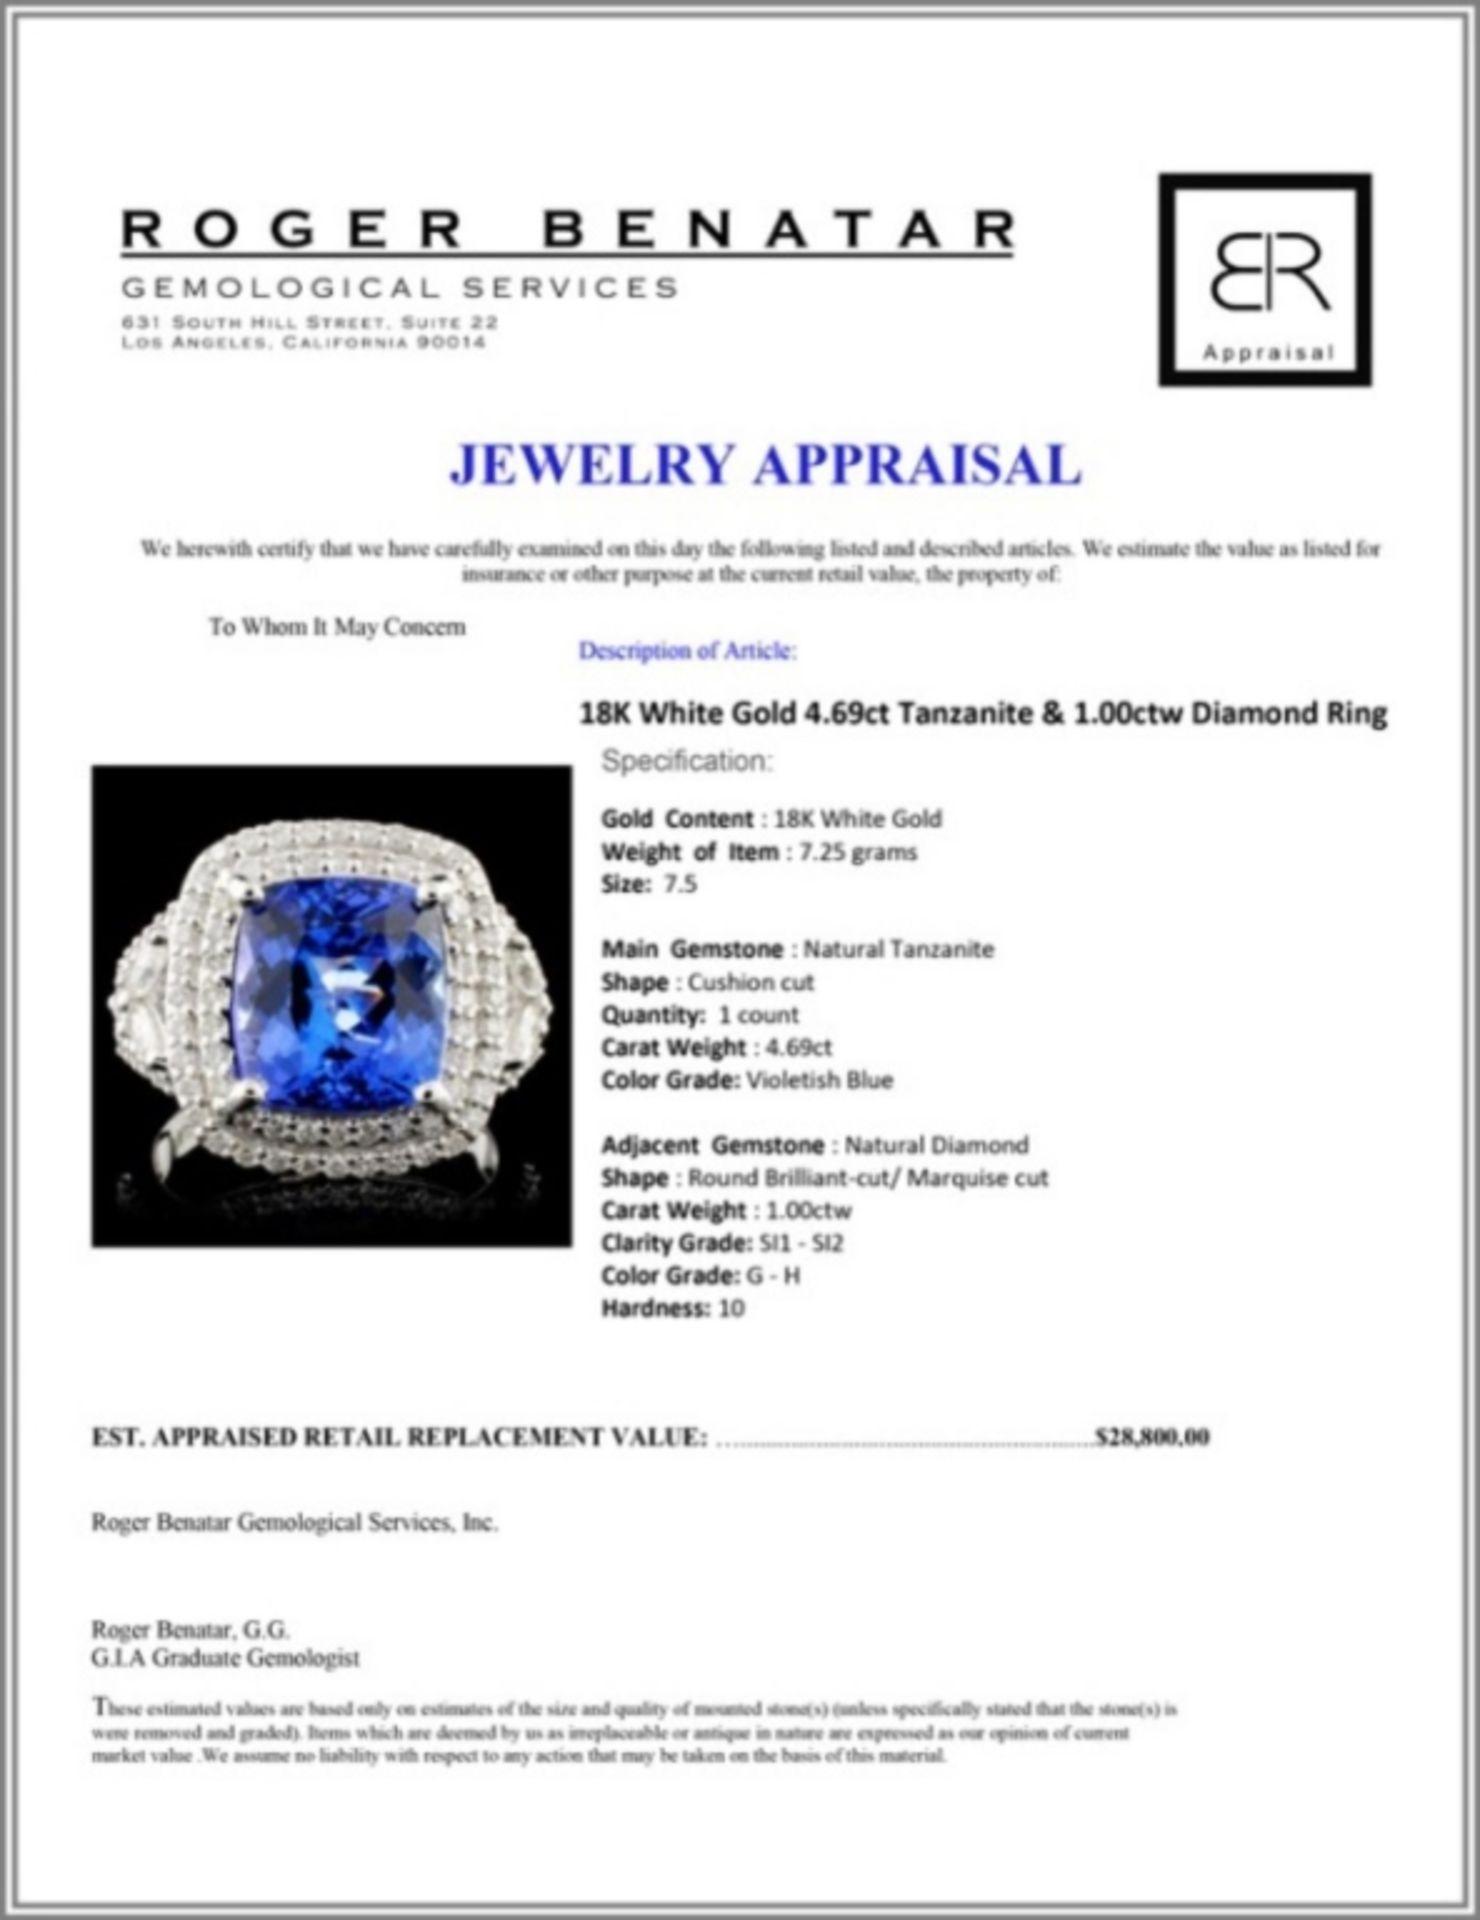 18K White Gold 4.69ct Tanzanite & 1.00ctw Diamond - Image 4 of 4